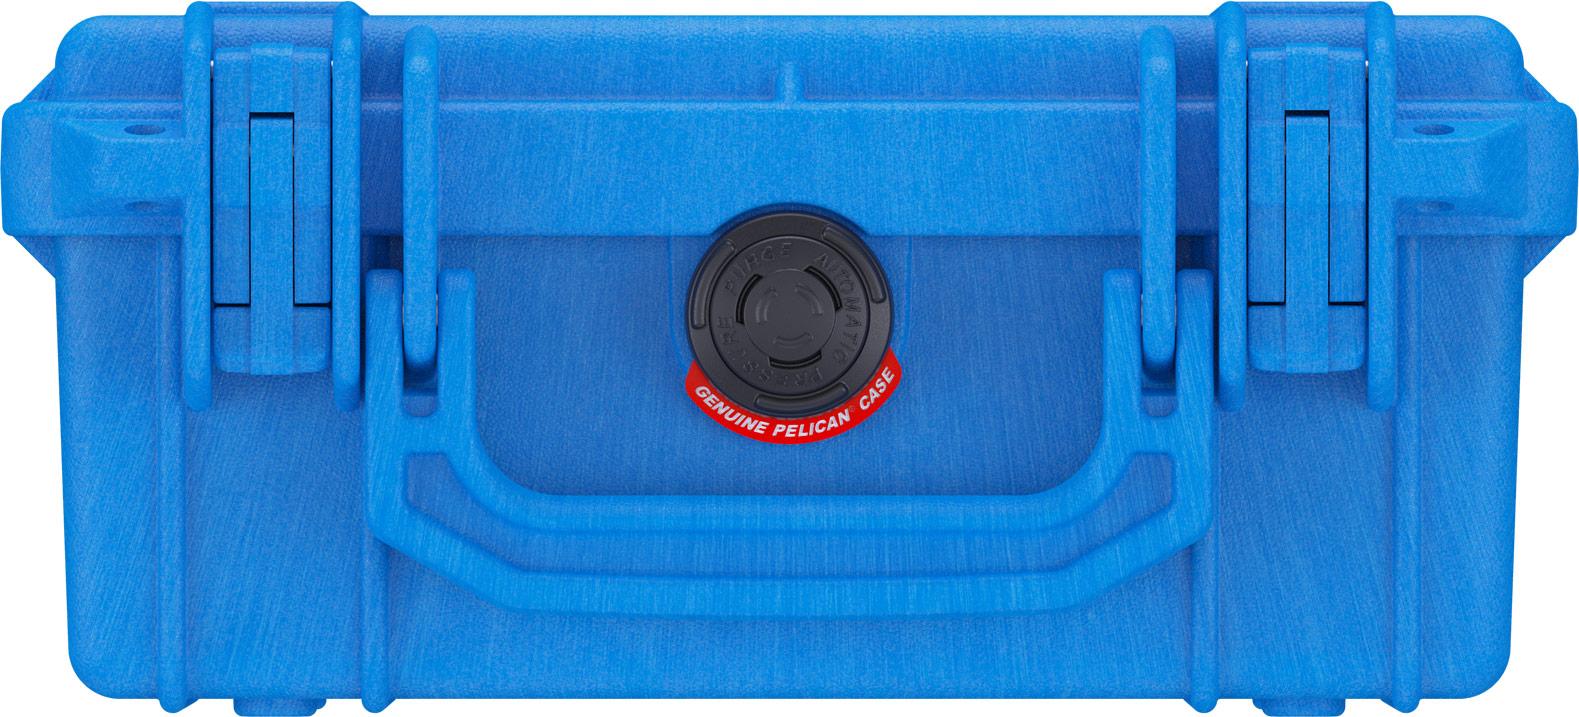 pelican protector 1150 blue watertight hard case